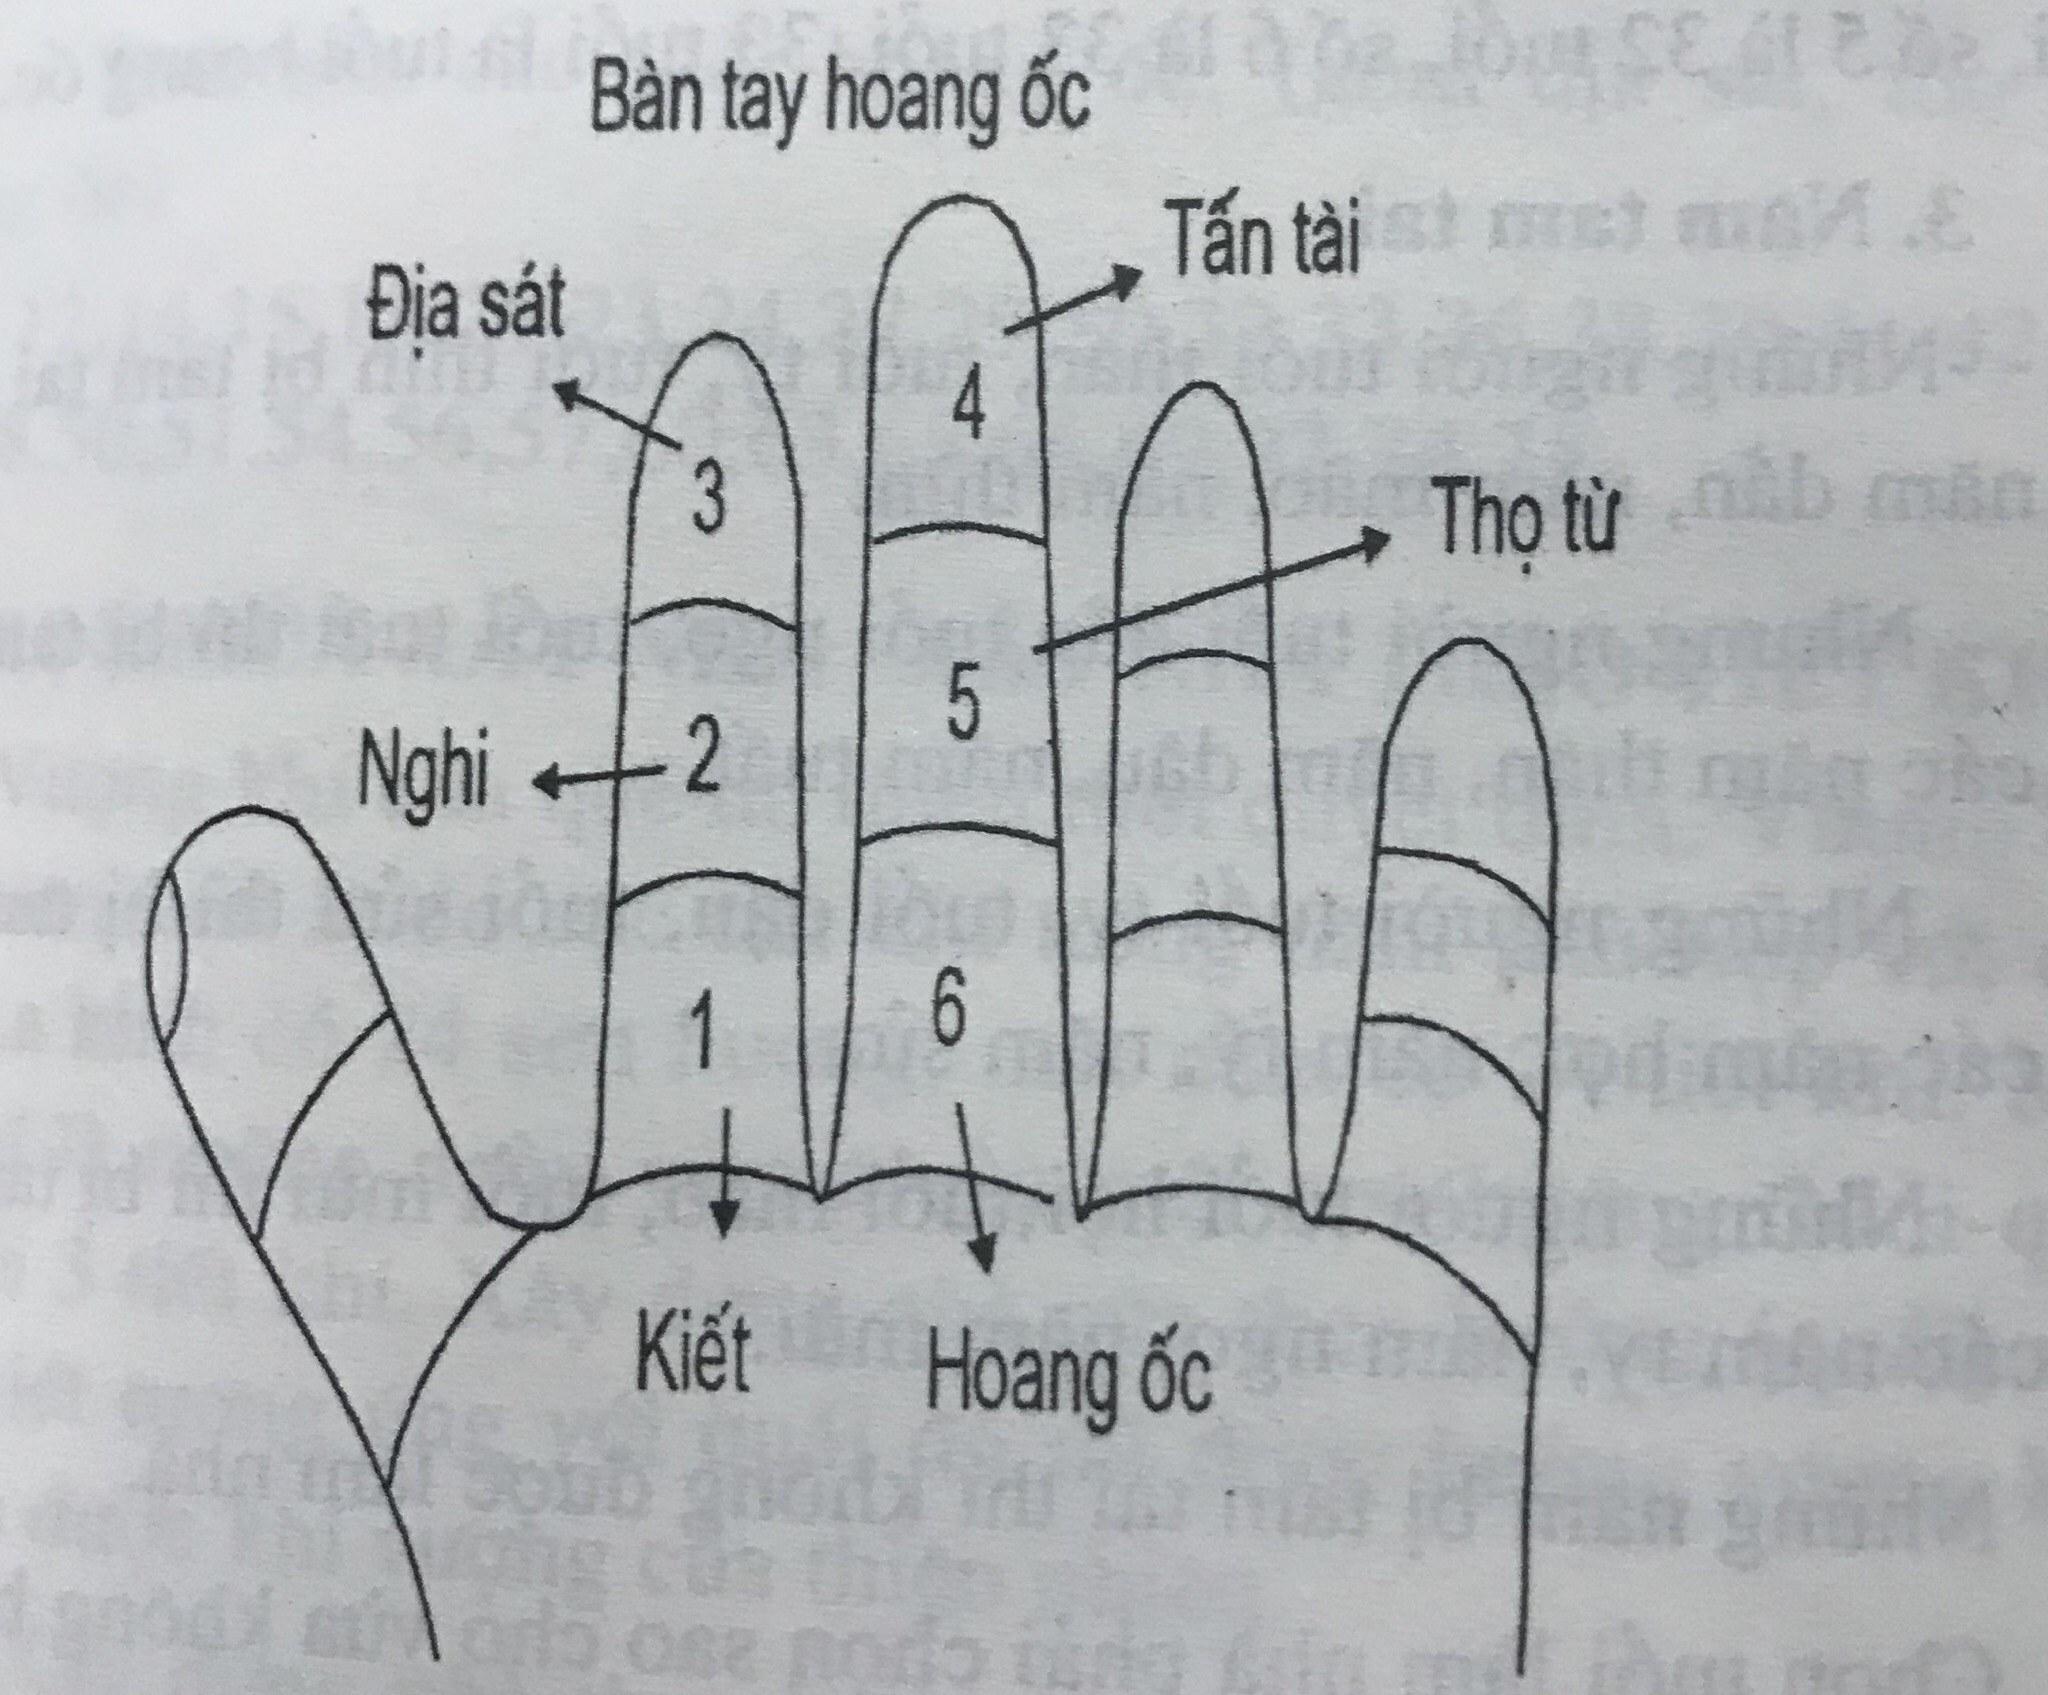 xem-tuoi-lam-nha-chuan-nhat-2020-1